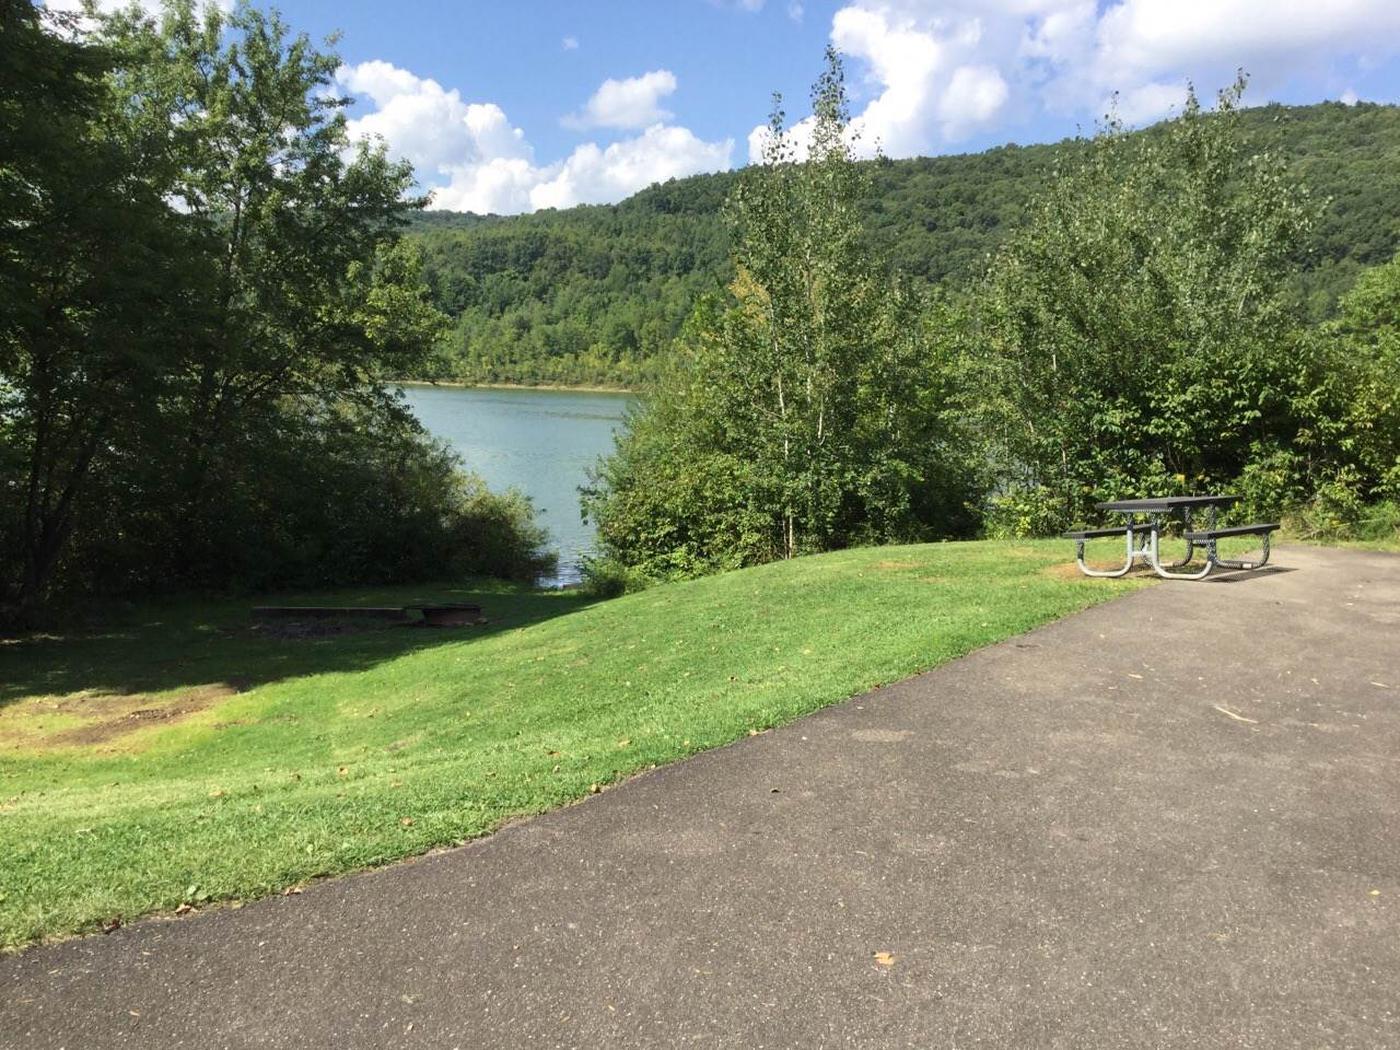 Willow Bay Recreation Area: Campsite 64